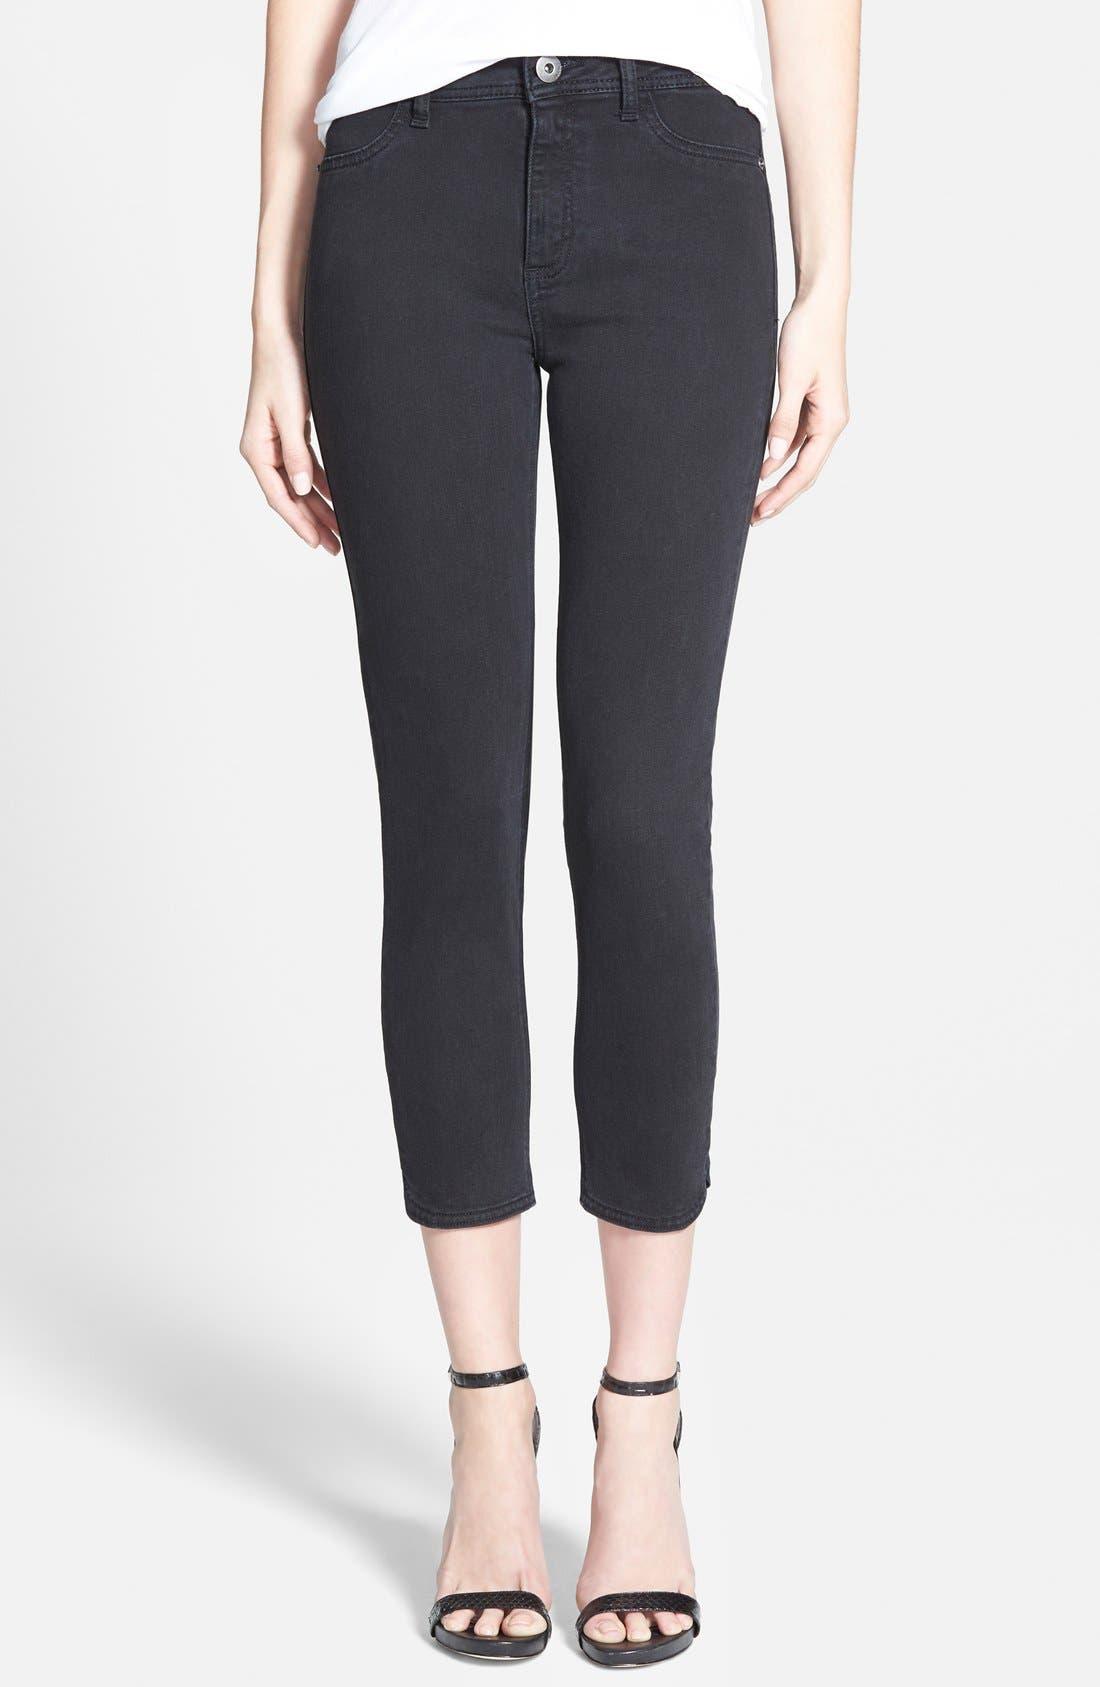 Main Image - DL1961 'Bardot' Crop Skinny Jeans (Rhett)